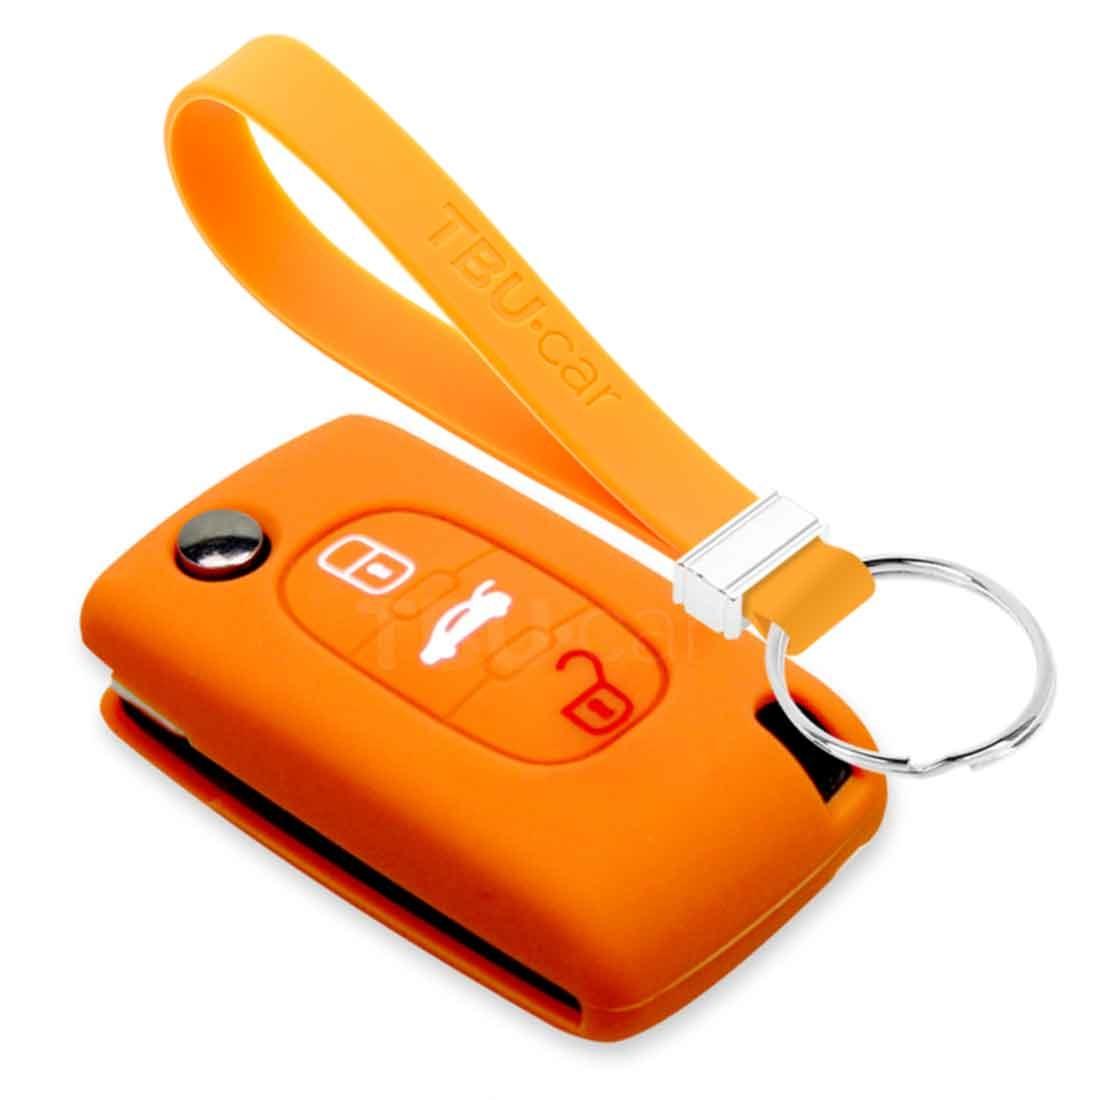 TBU car TBU car Sleutel cover compatibel met Fiat - Silicone sleutelhoesje - beschermhoesje autosleutel - Oranje